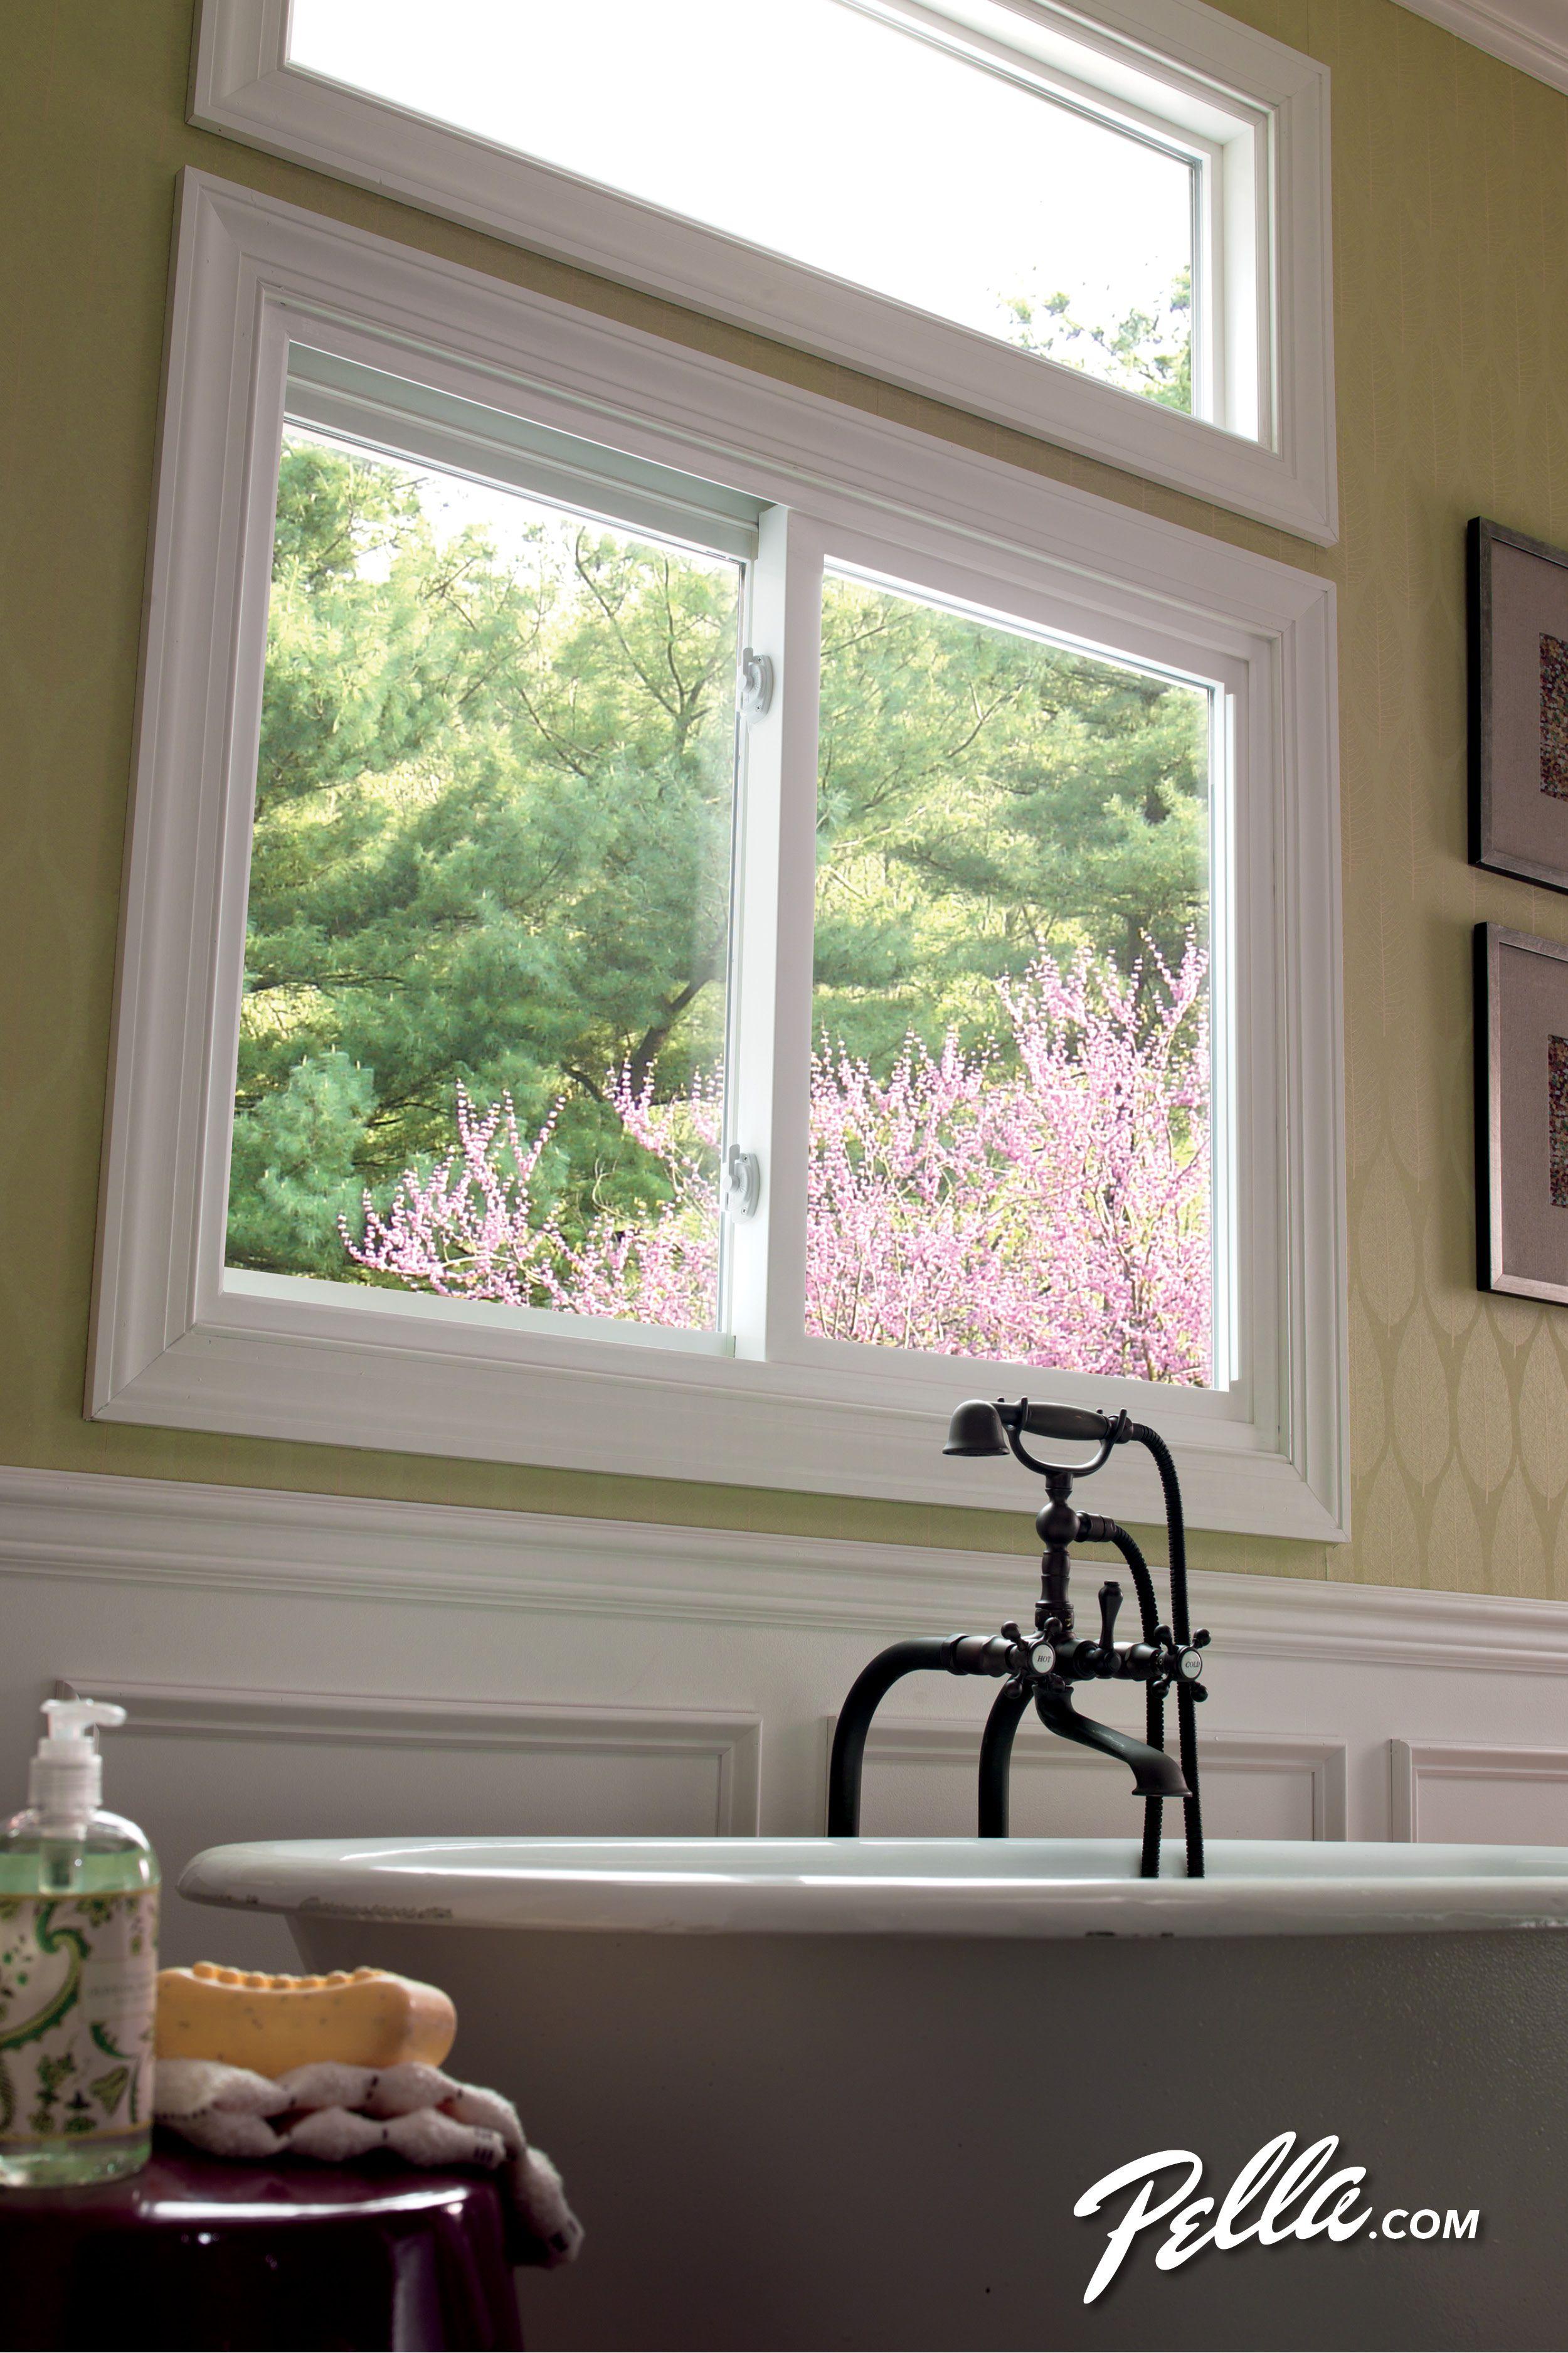 pella sliding windows kitchen create better view with pella energy starqualified 350 series vinyl sliding window series